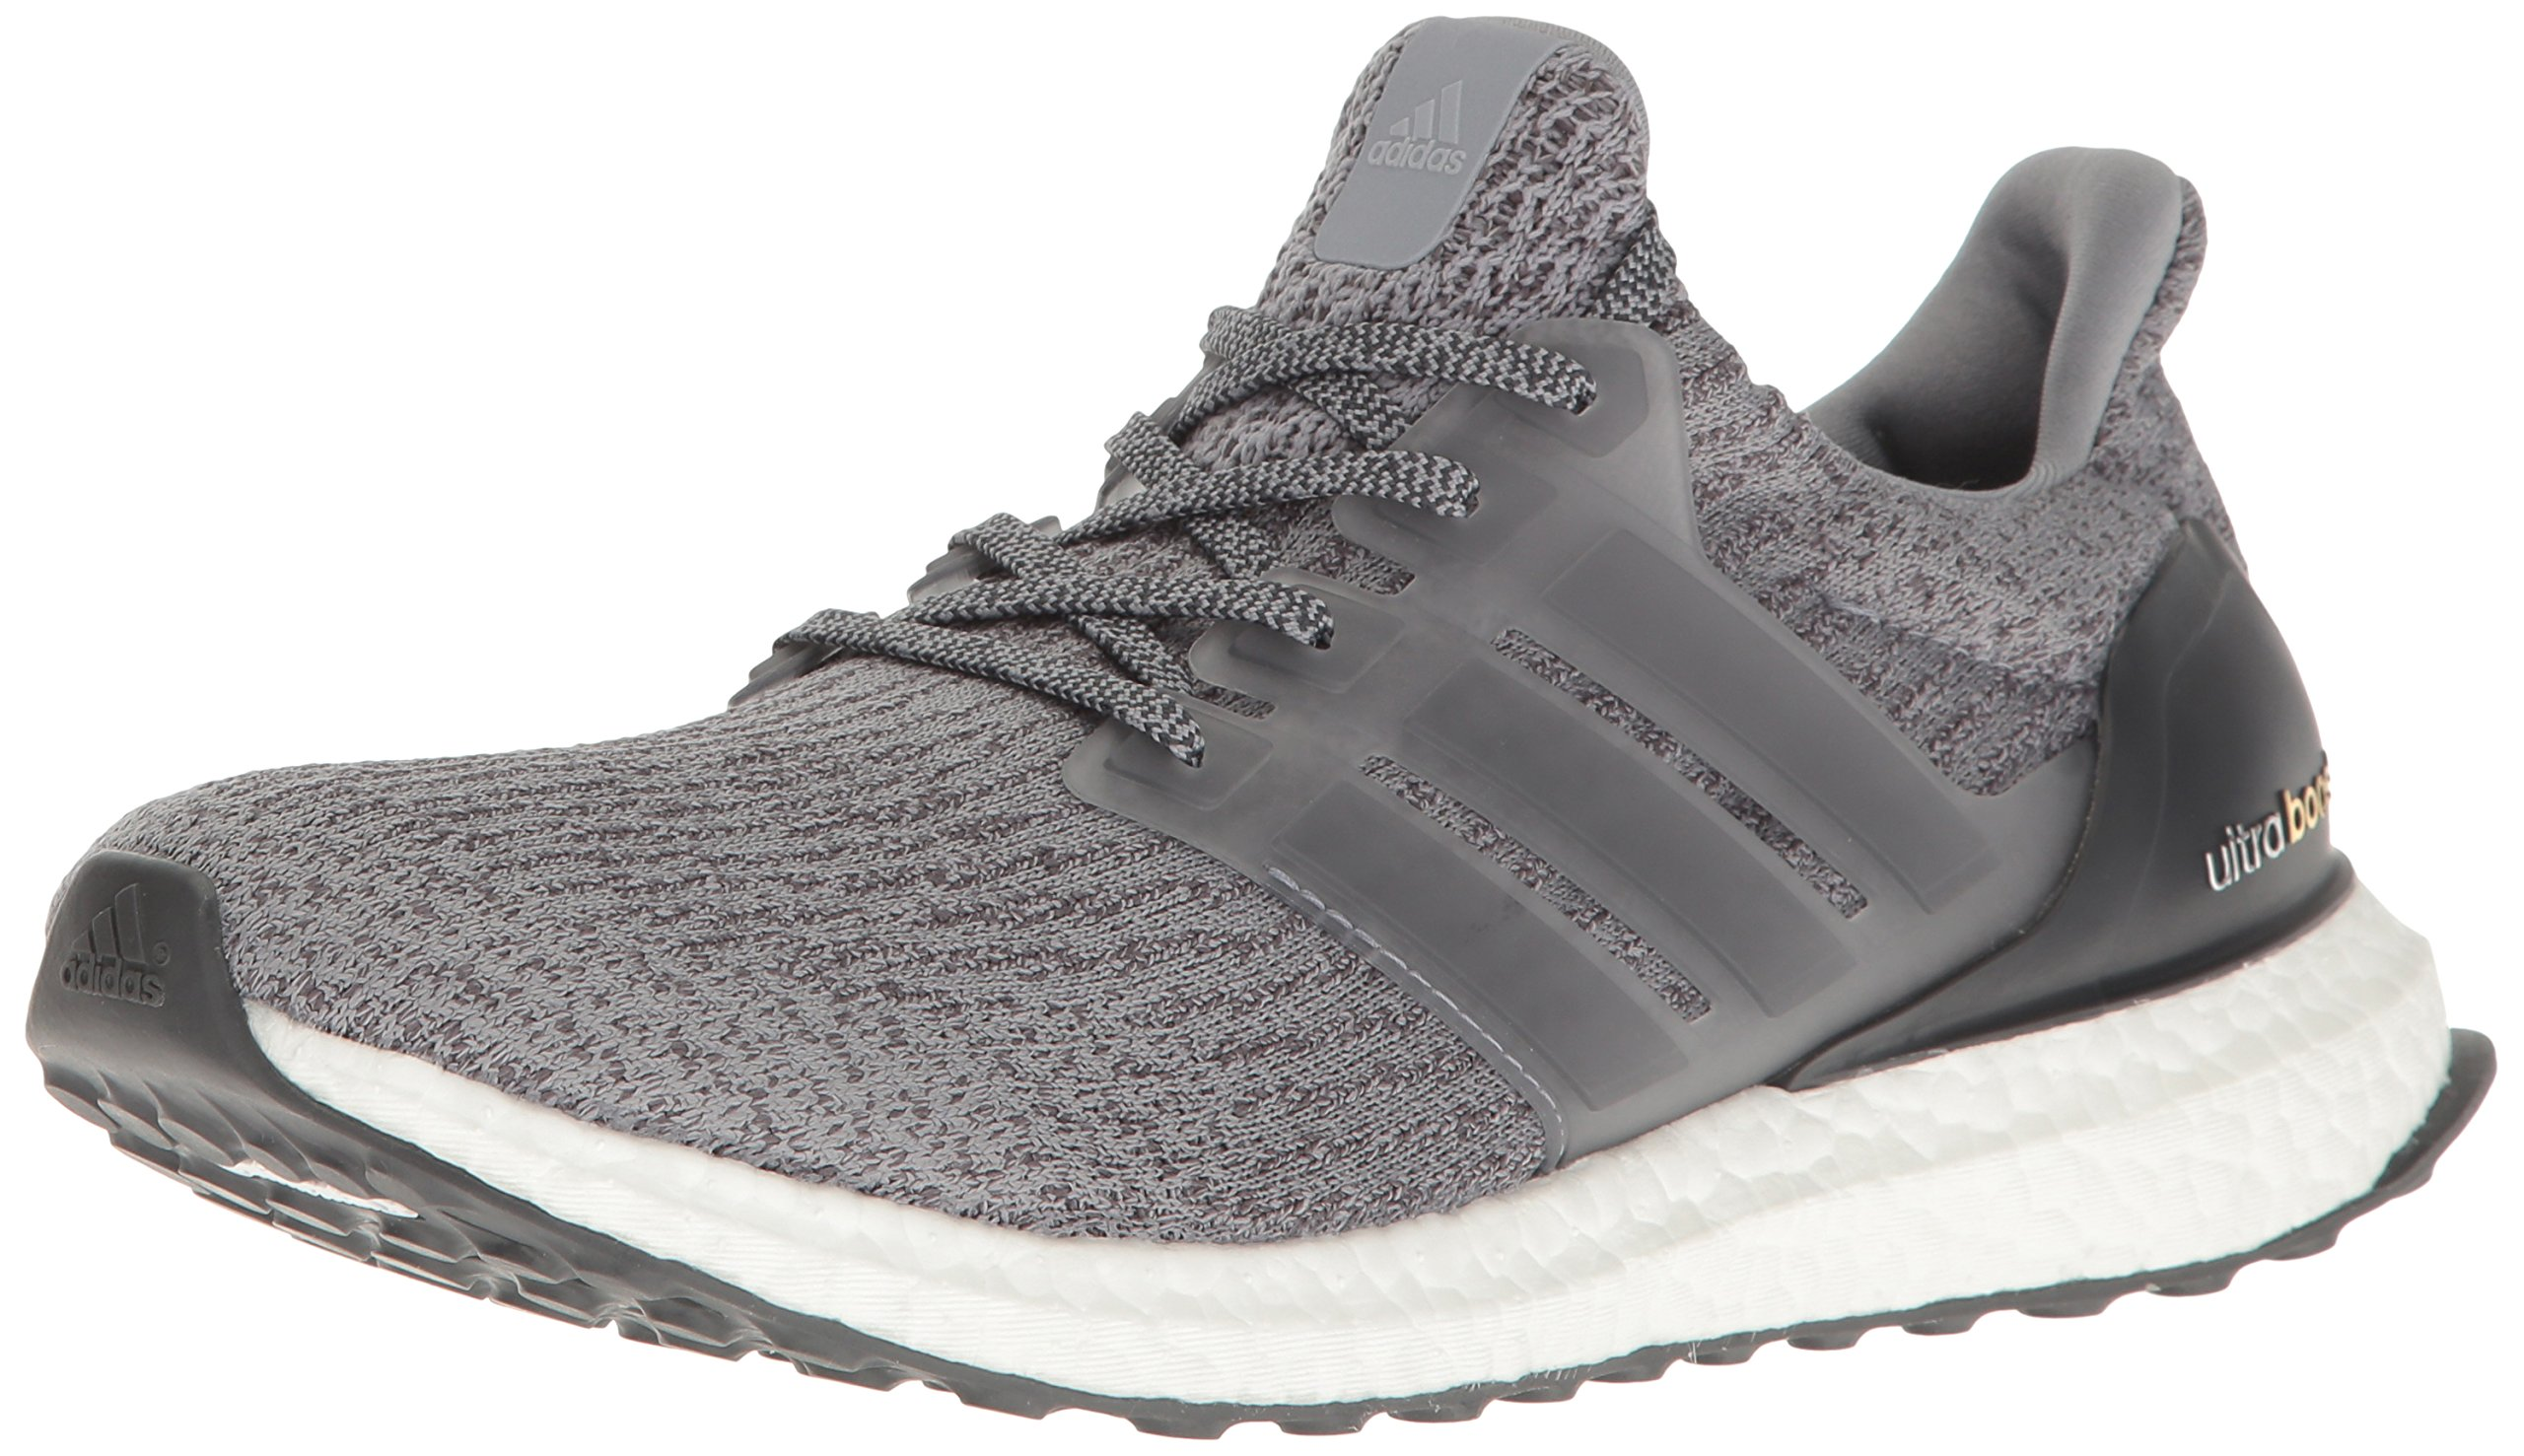 adidas Men's Ultraboost Running Shoe, Dark Grey Heather, 4 M US by adidas (Image #1)